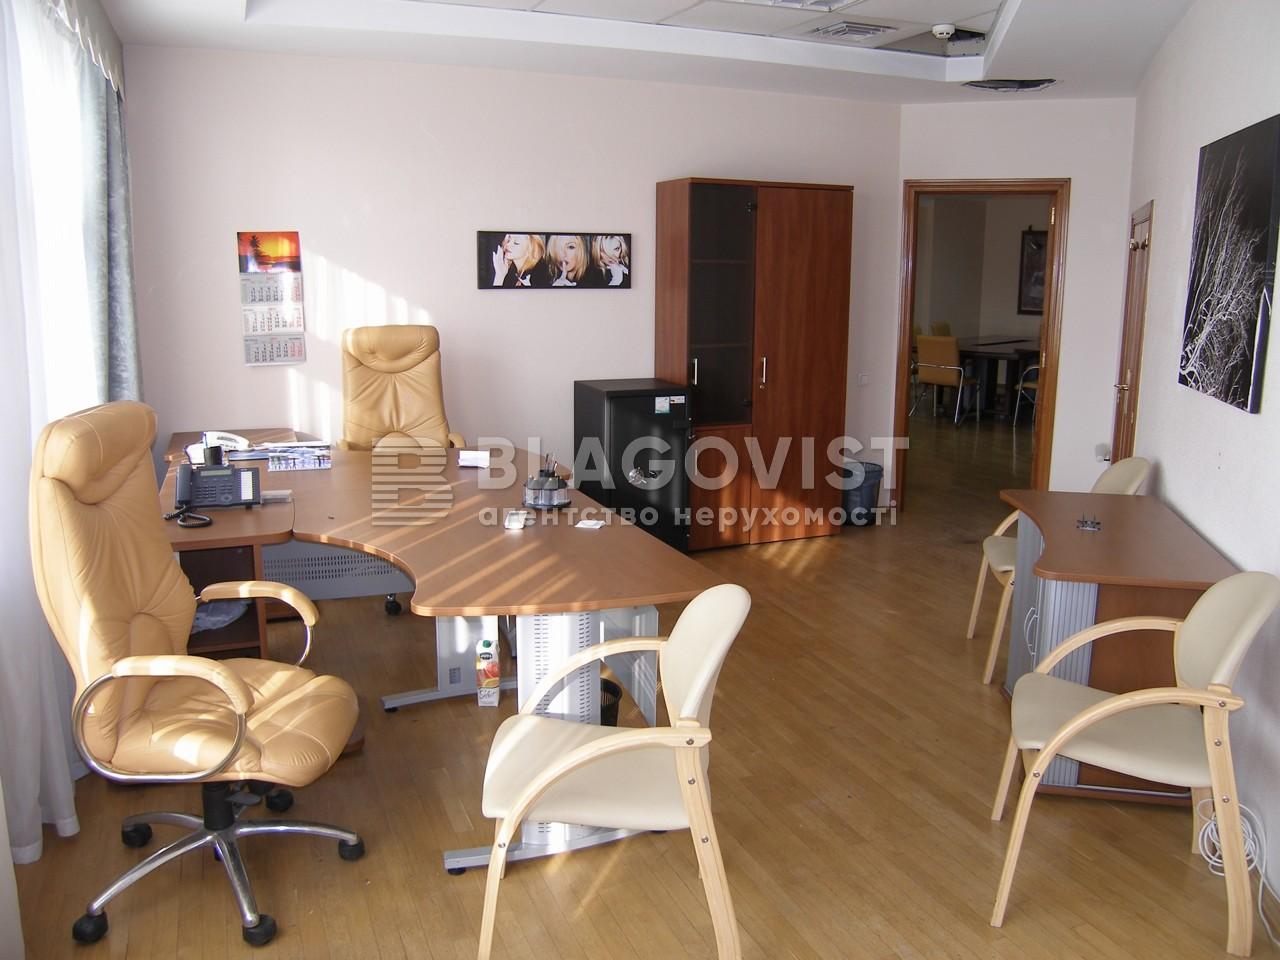 Бизнес-центр, H-37819, Петрозаводска, Киев - Фото 11